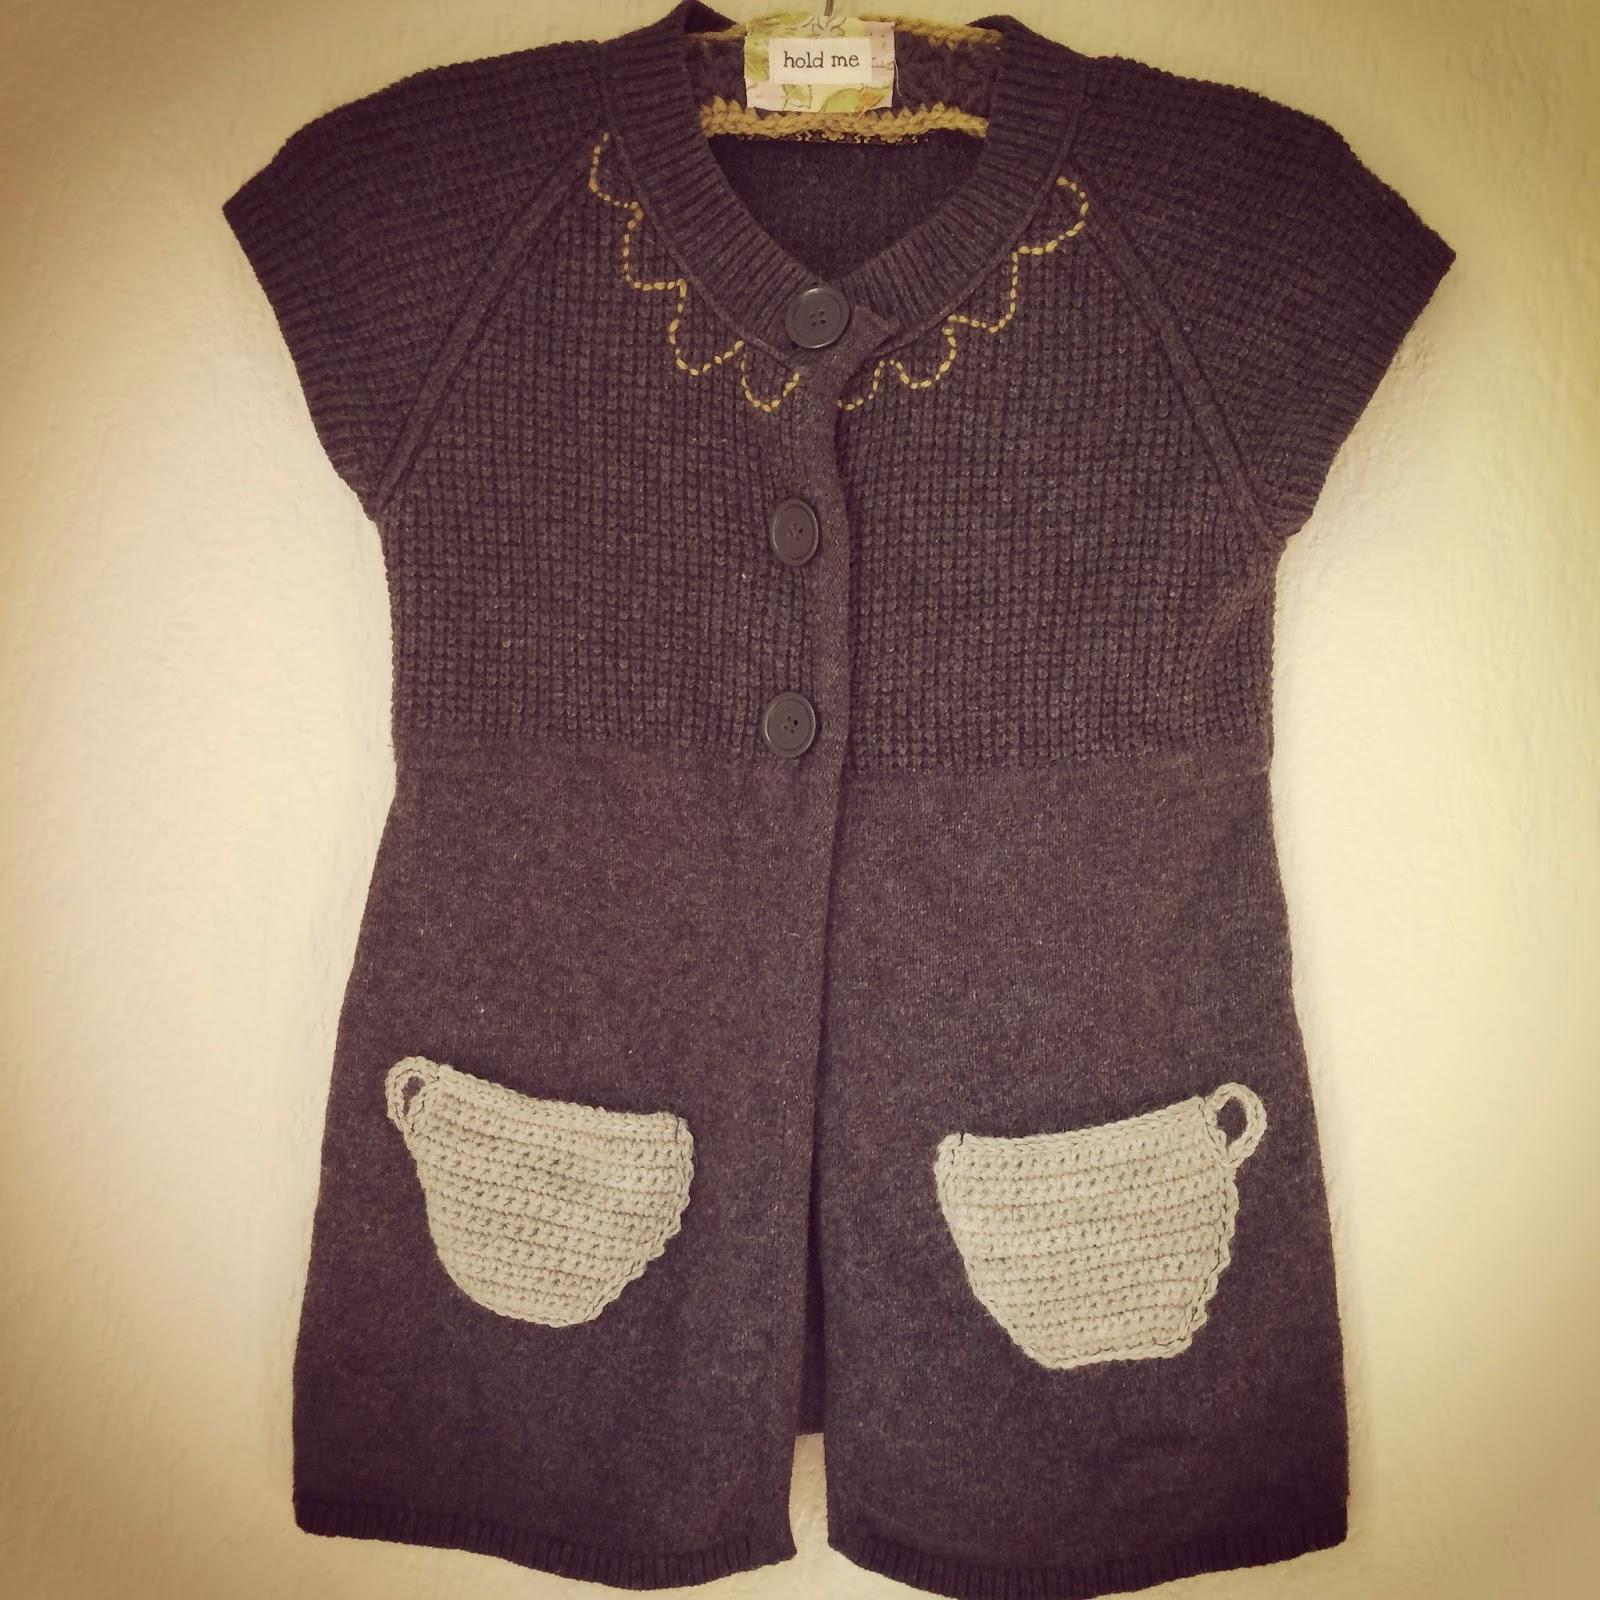 Maize Hutton: Crochet a Teacup Pocket-Free Pattern!